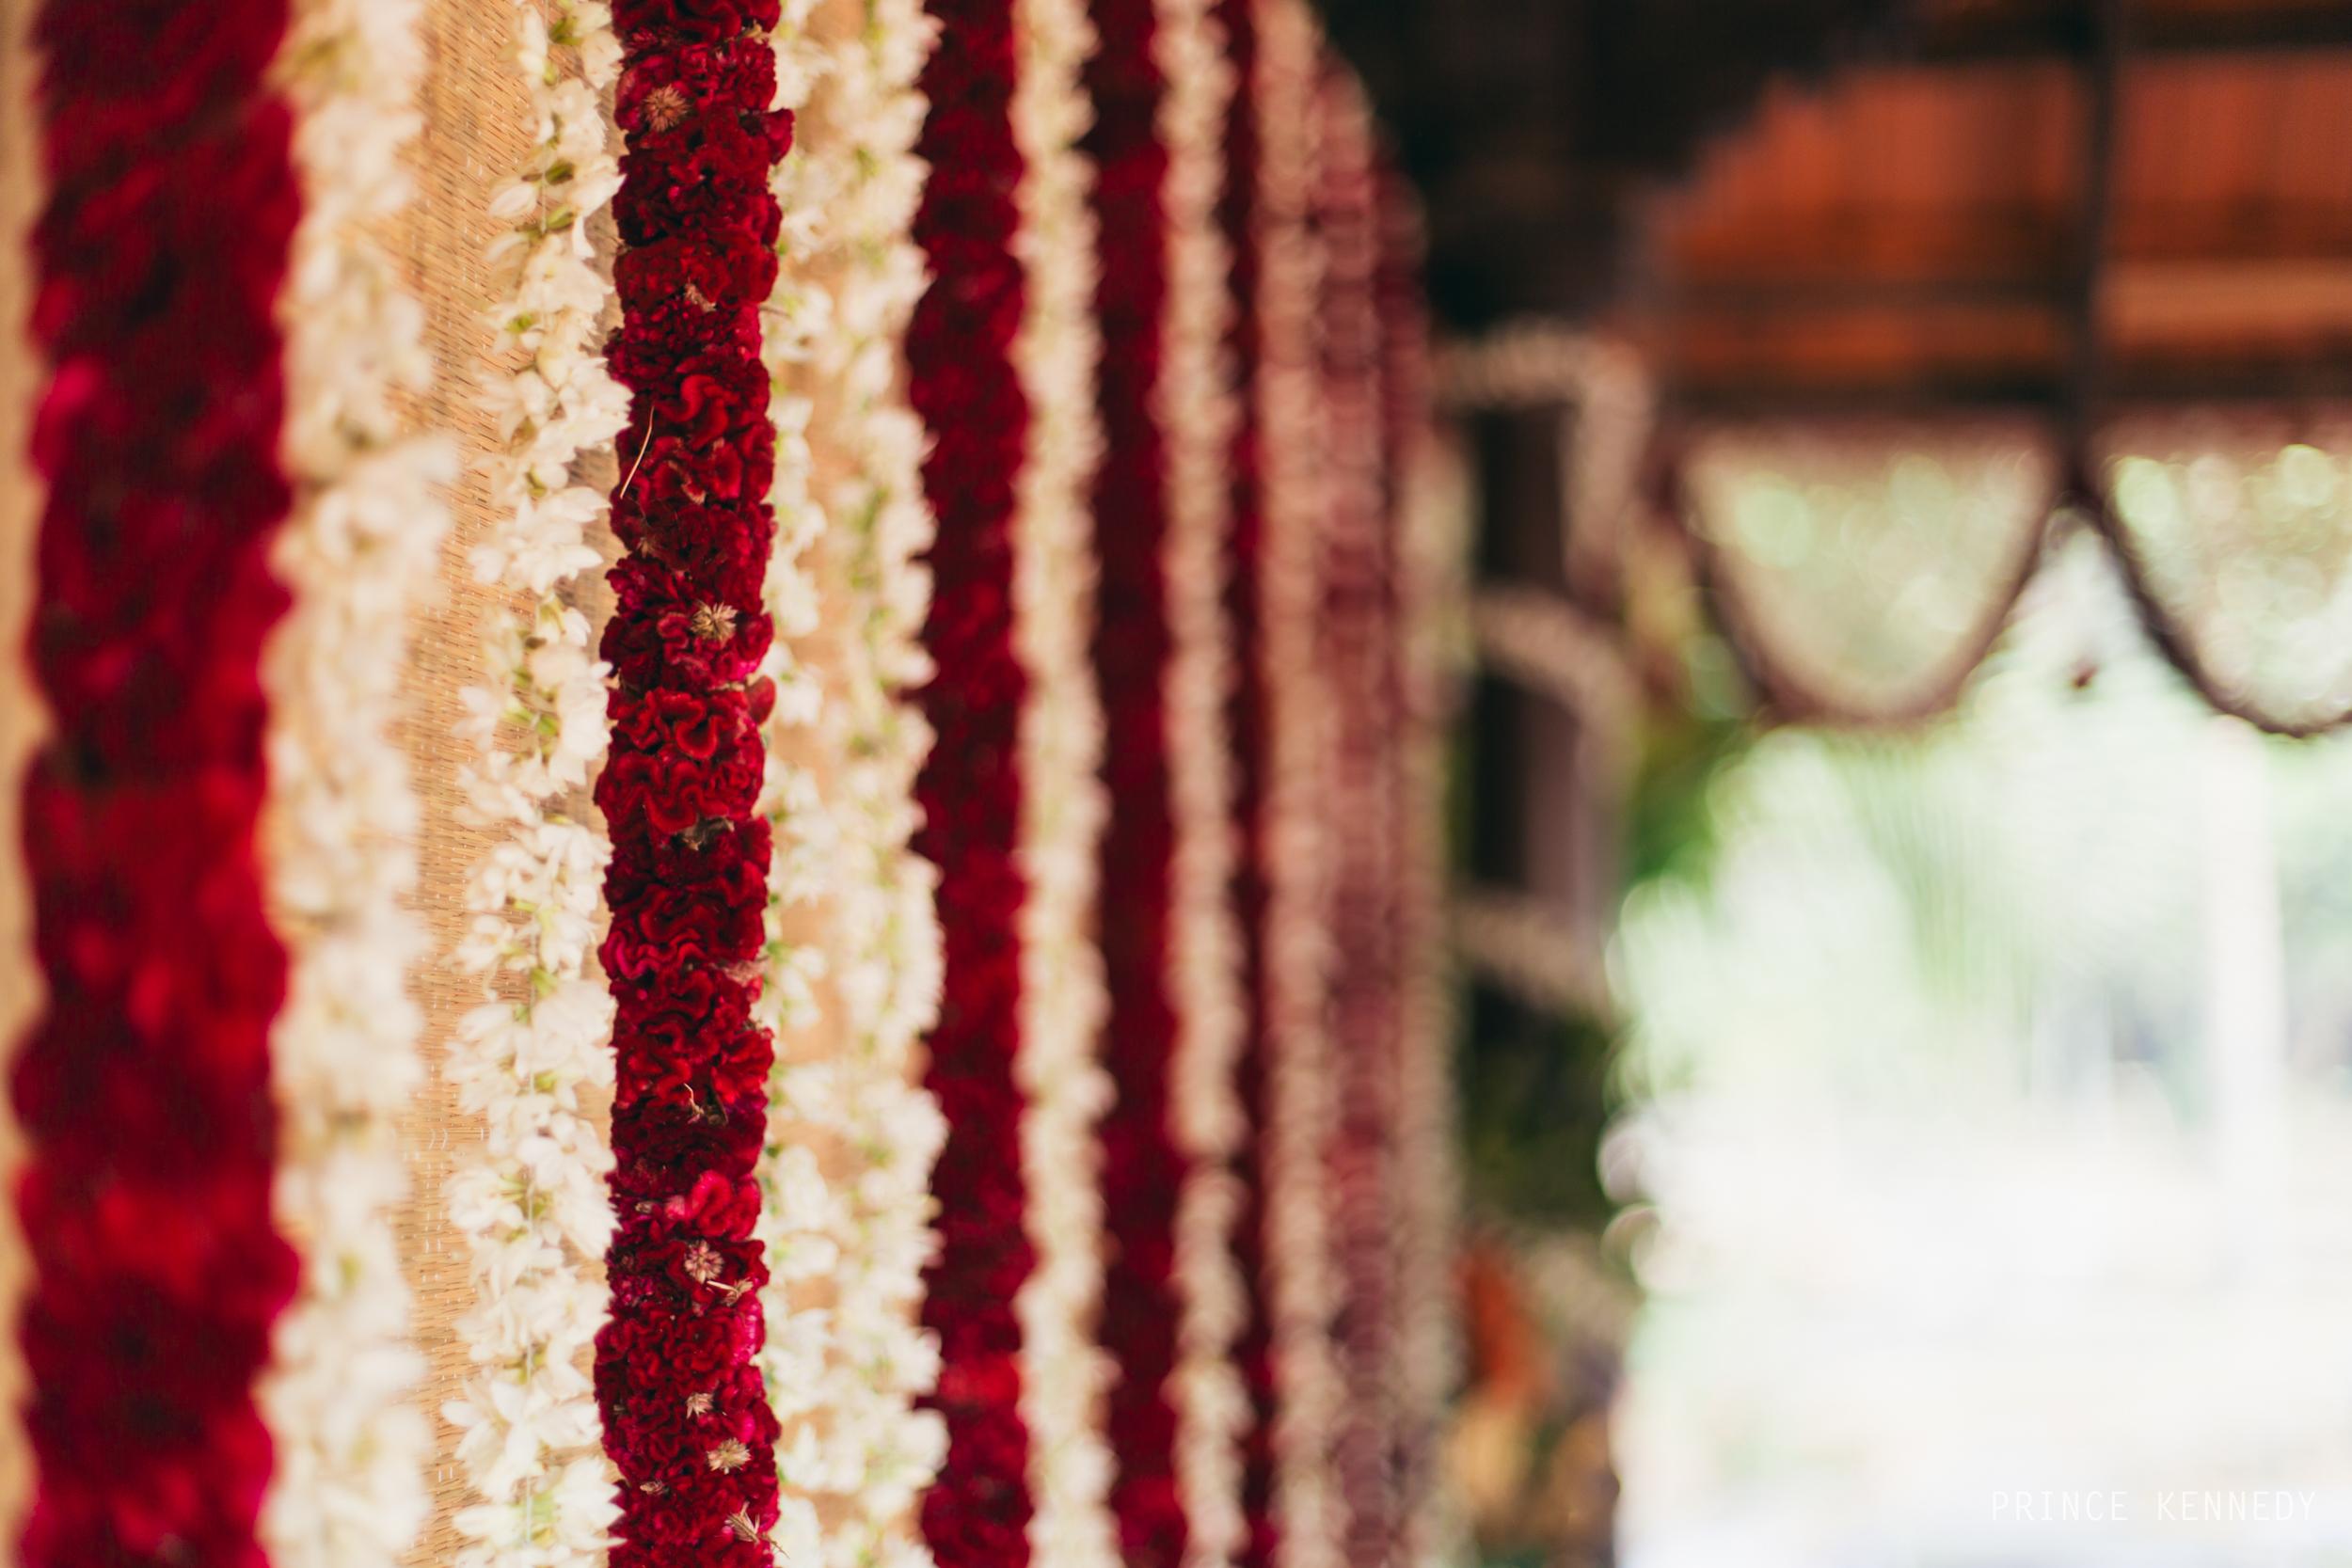 Athmajja-Nithesh-Engagement-Couple-Portrait-Portraiture-Wedding-Couple-Portrait-Chennai-Photographer-Candid-Photography-Destination-Best-Prince-Kennedy-Photography-11.jpg